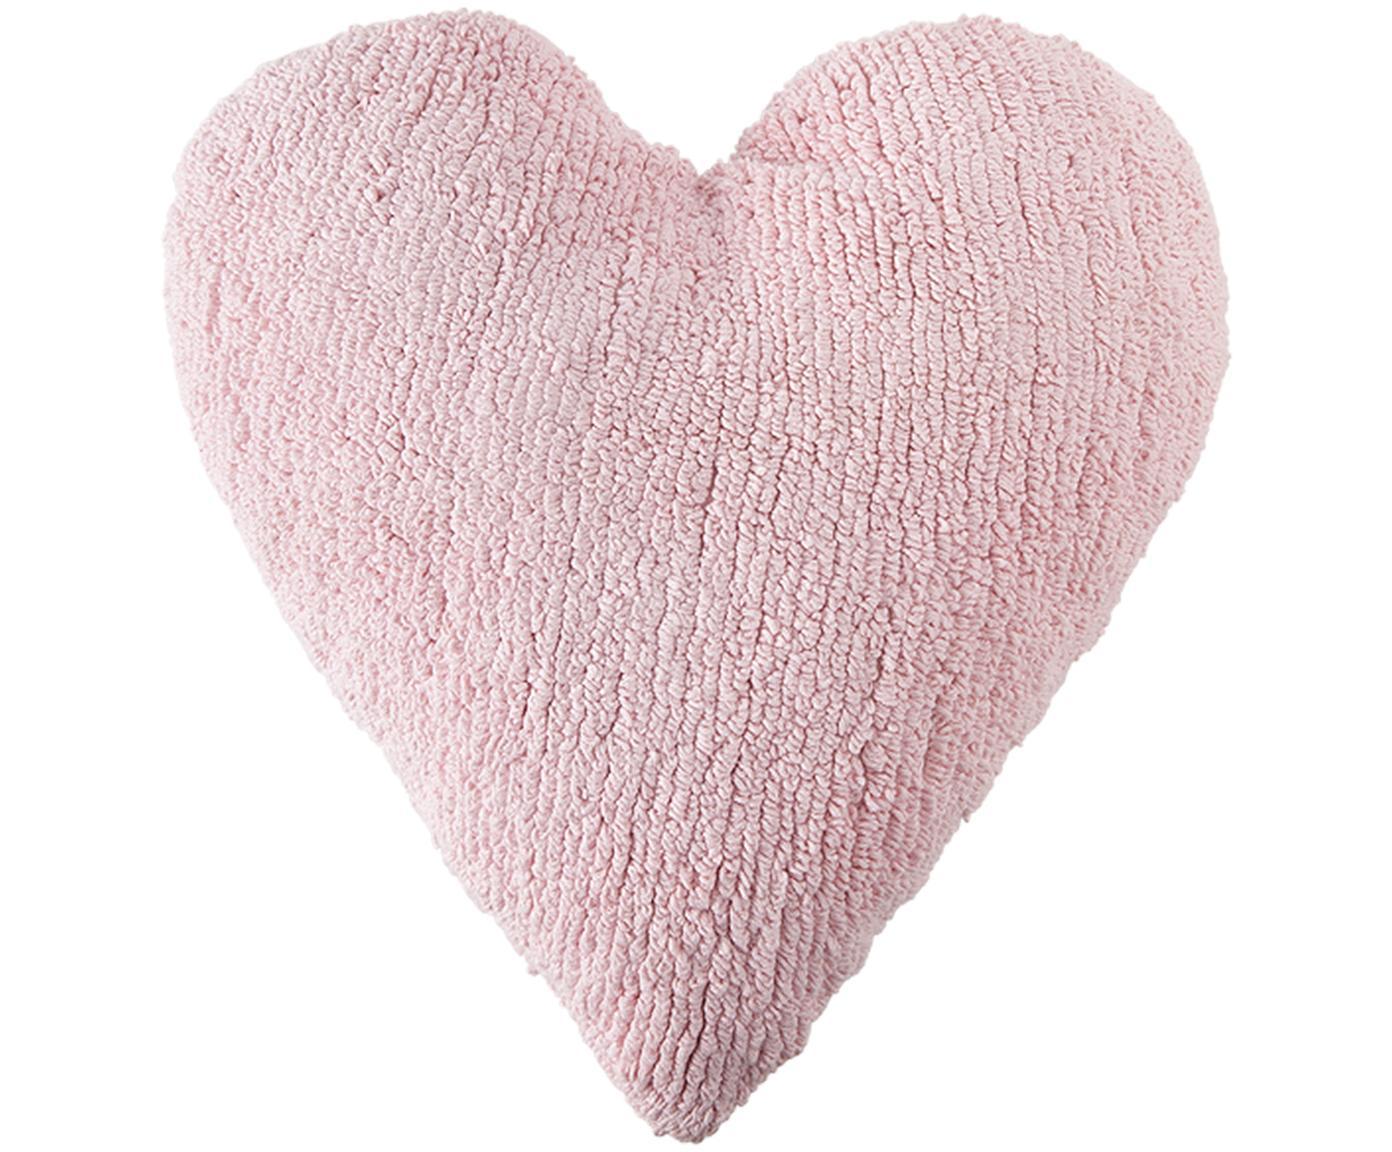 Cojín Corazón, con relleno, Funda: 97%algodón, 3%algodón r, Rosa pálido, An 47 x L 50 cm